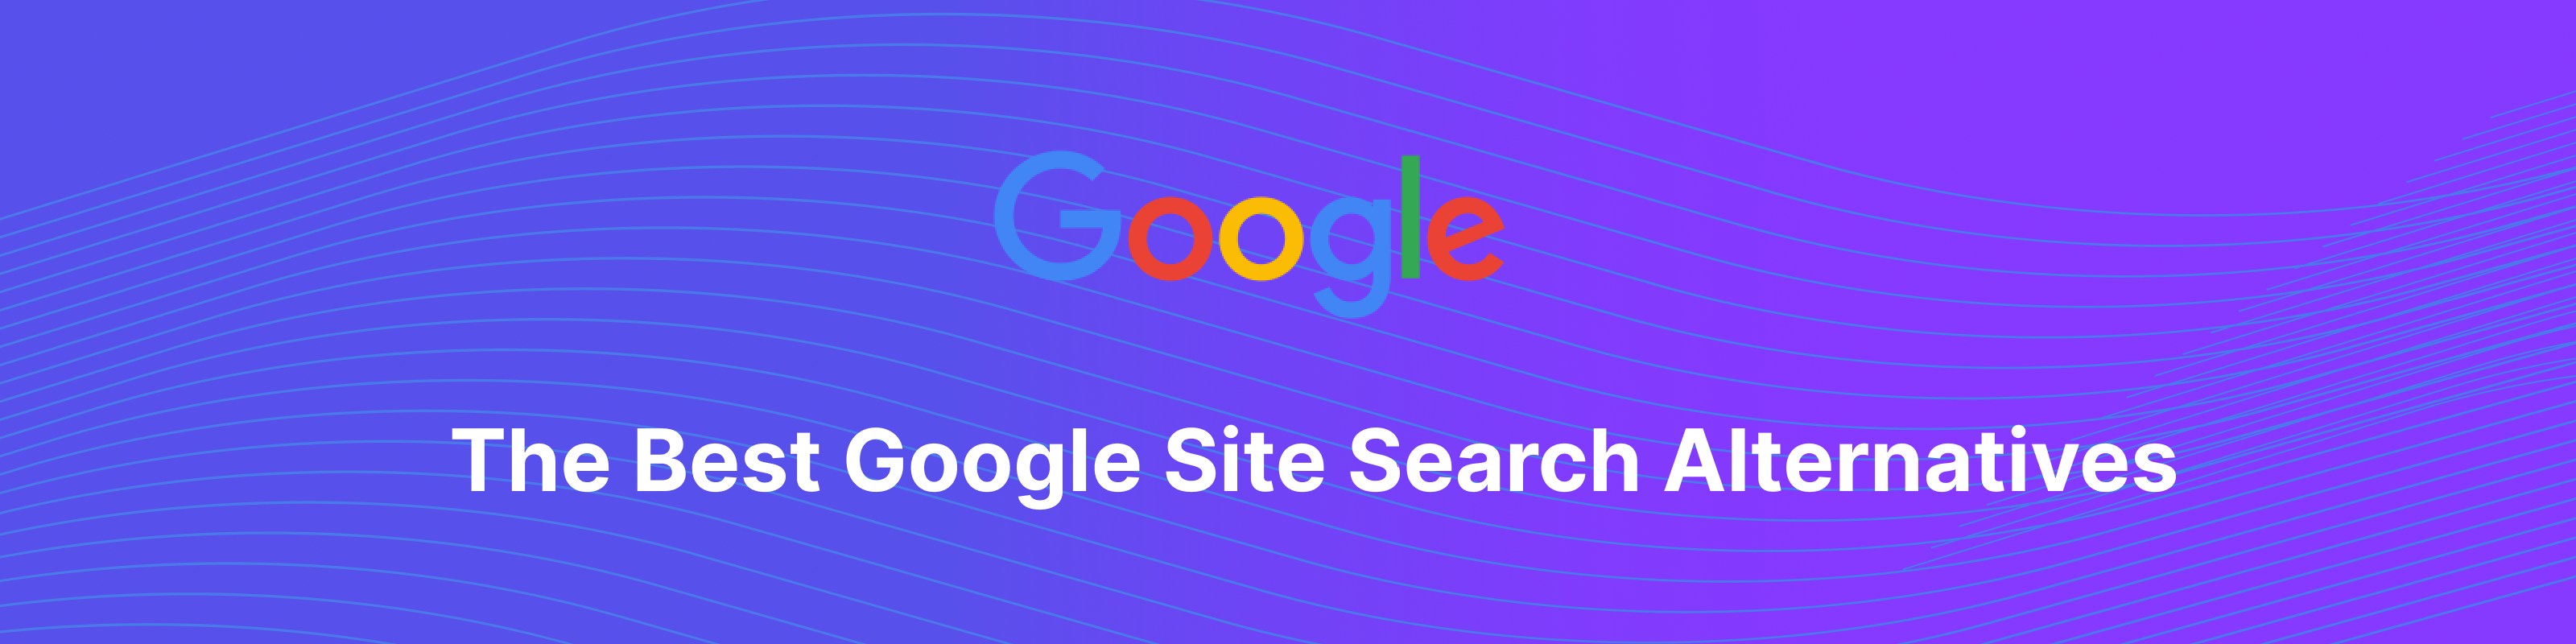 Google Site Search Alternatives banner